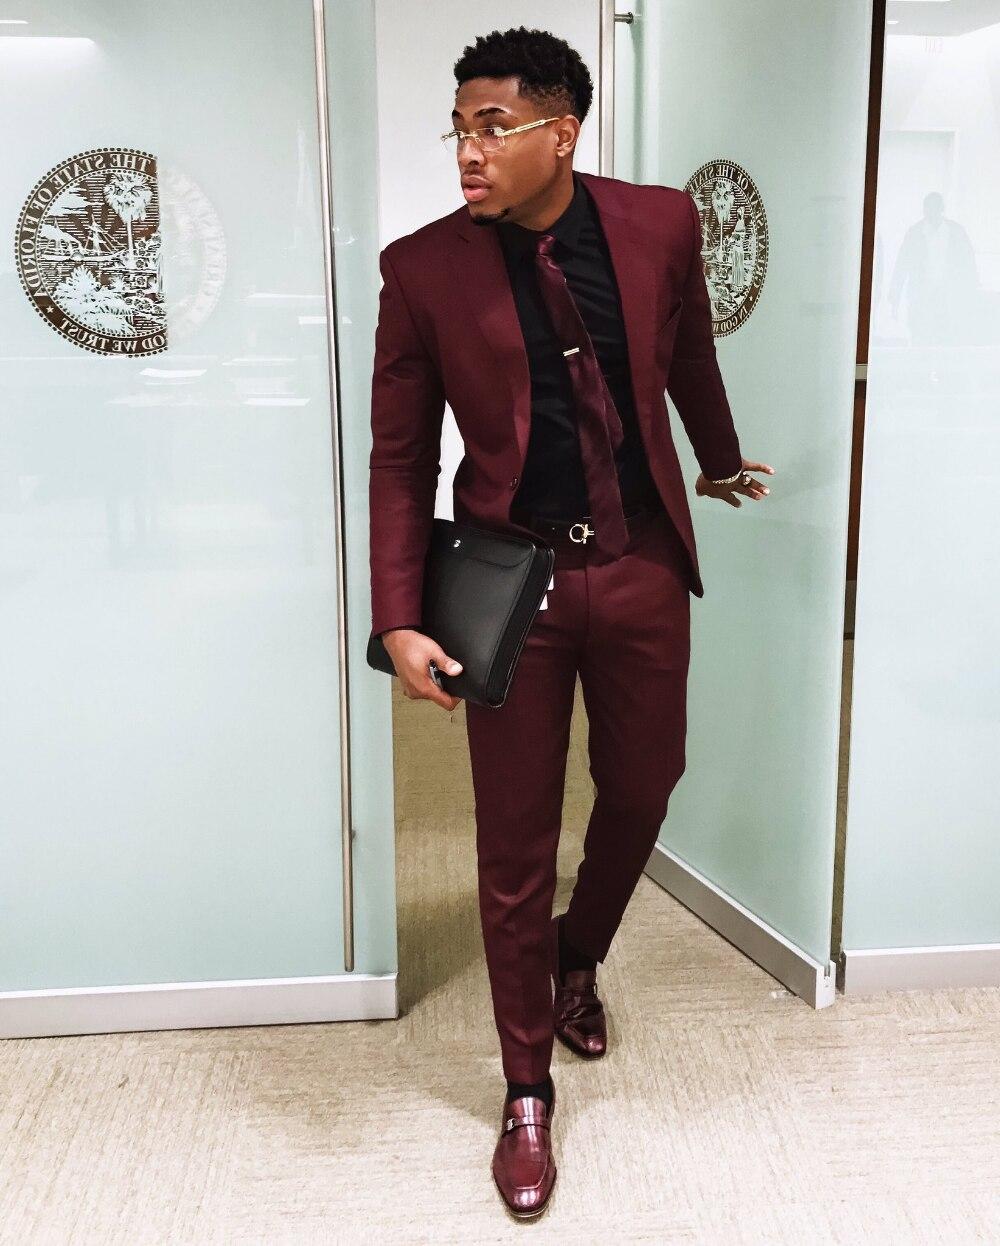 New Fashion Burgundy Slim Men's Suit 2 Piece Mens Suits Blazer Custom Elegant Tuxedo Bridal Dance Party Jacket Dress 1